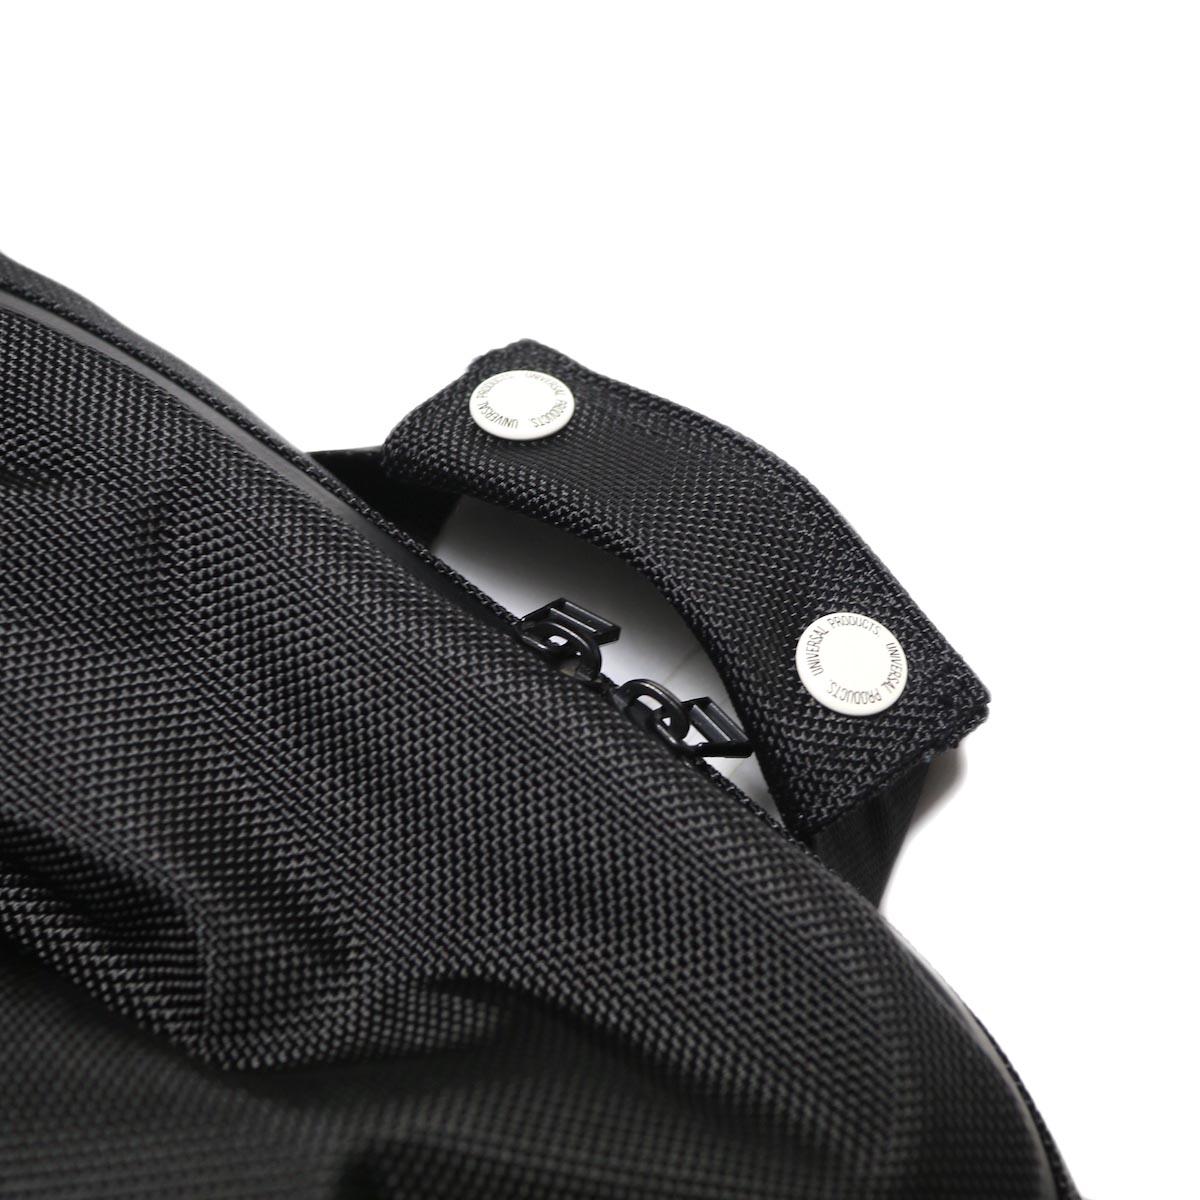 UNIVERSAL PRODUCTS / NEW UTILITY BAG (Black)ハンドル